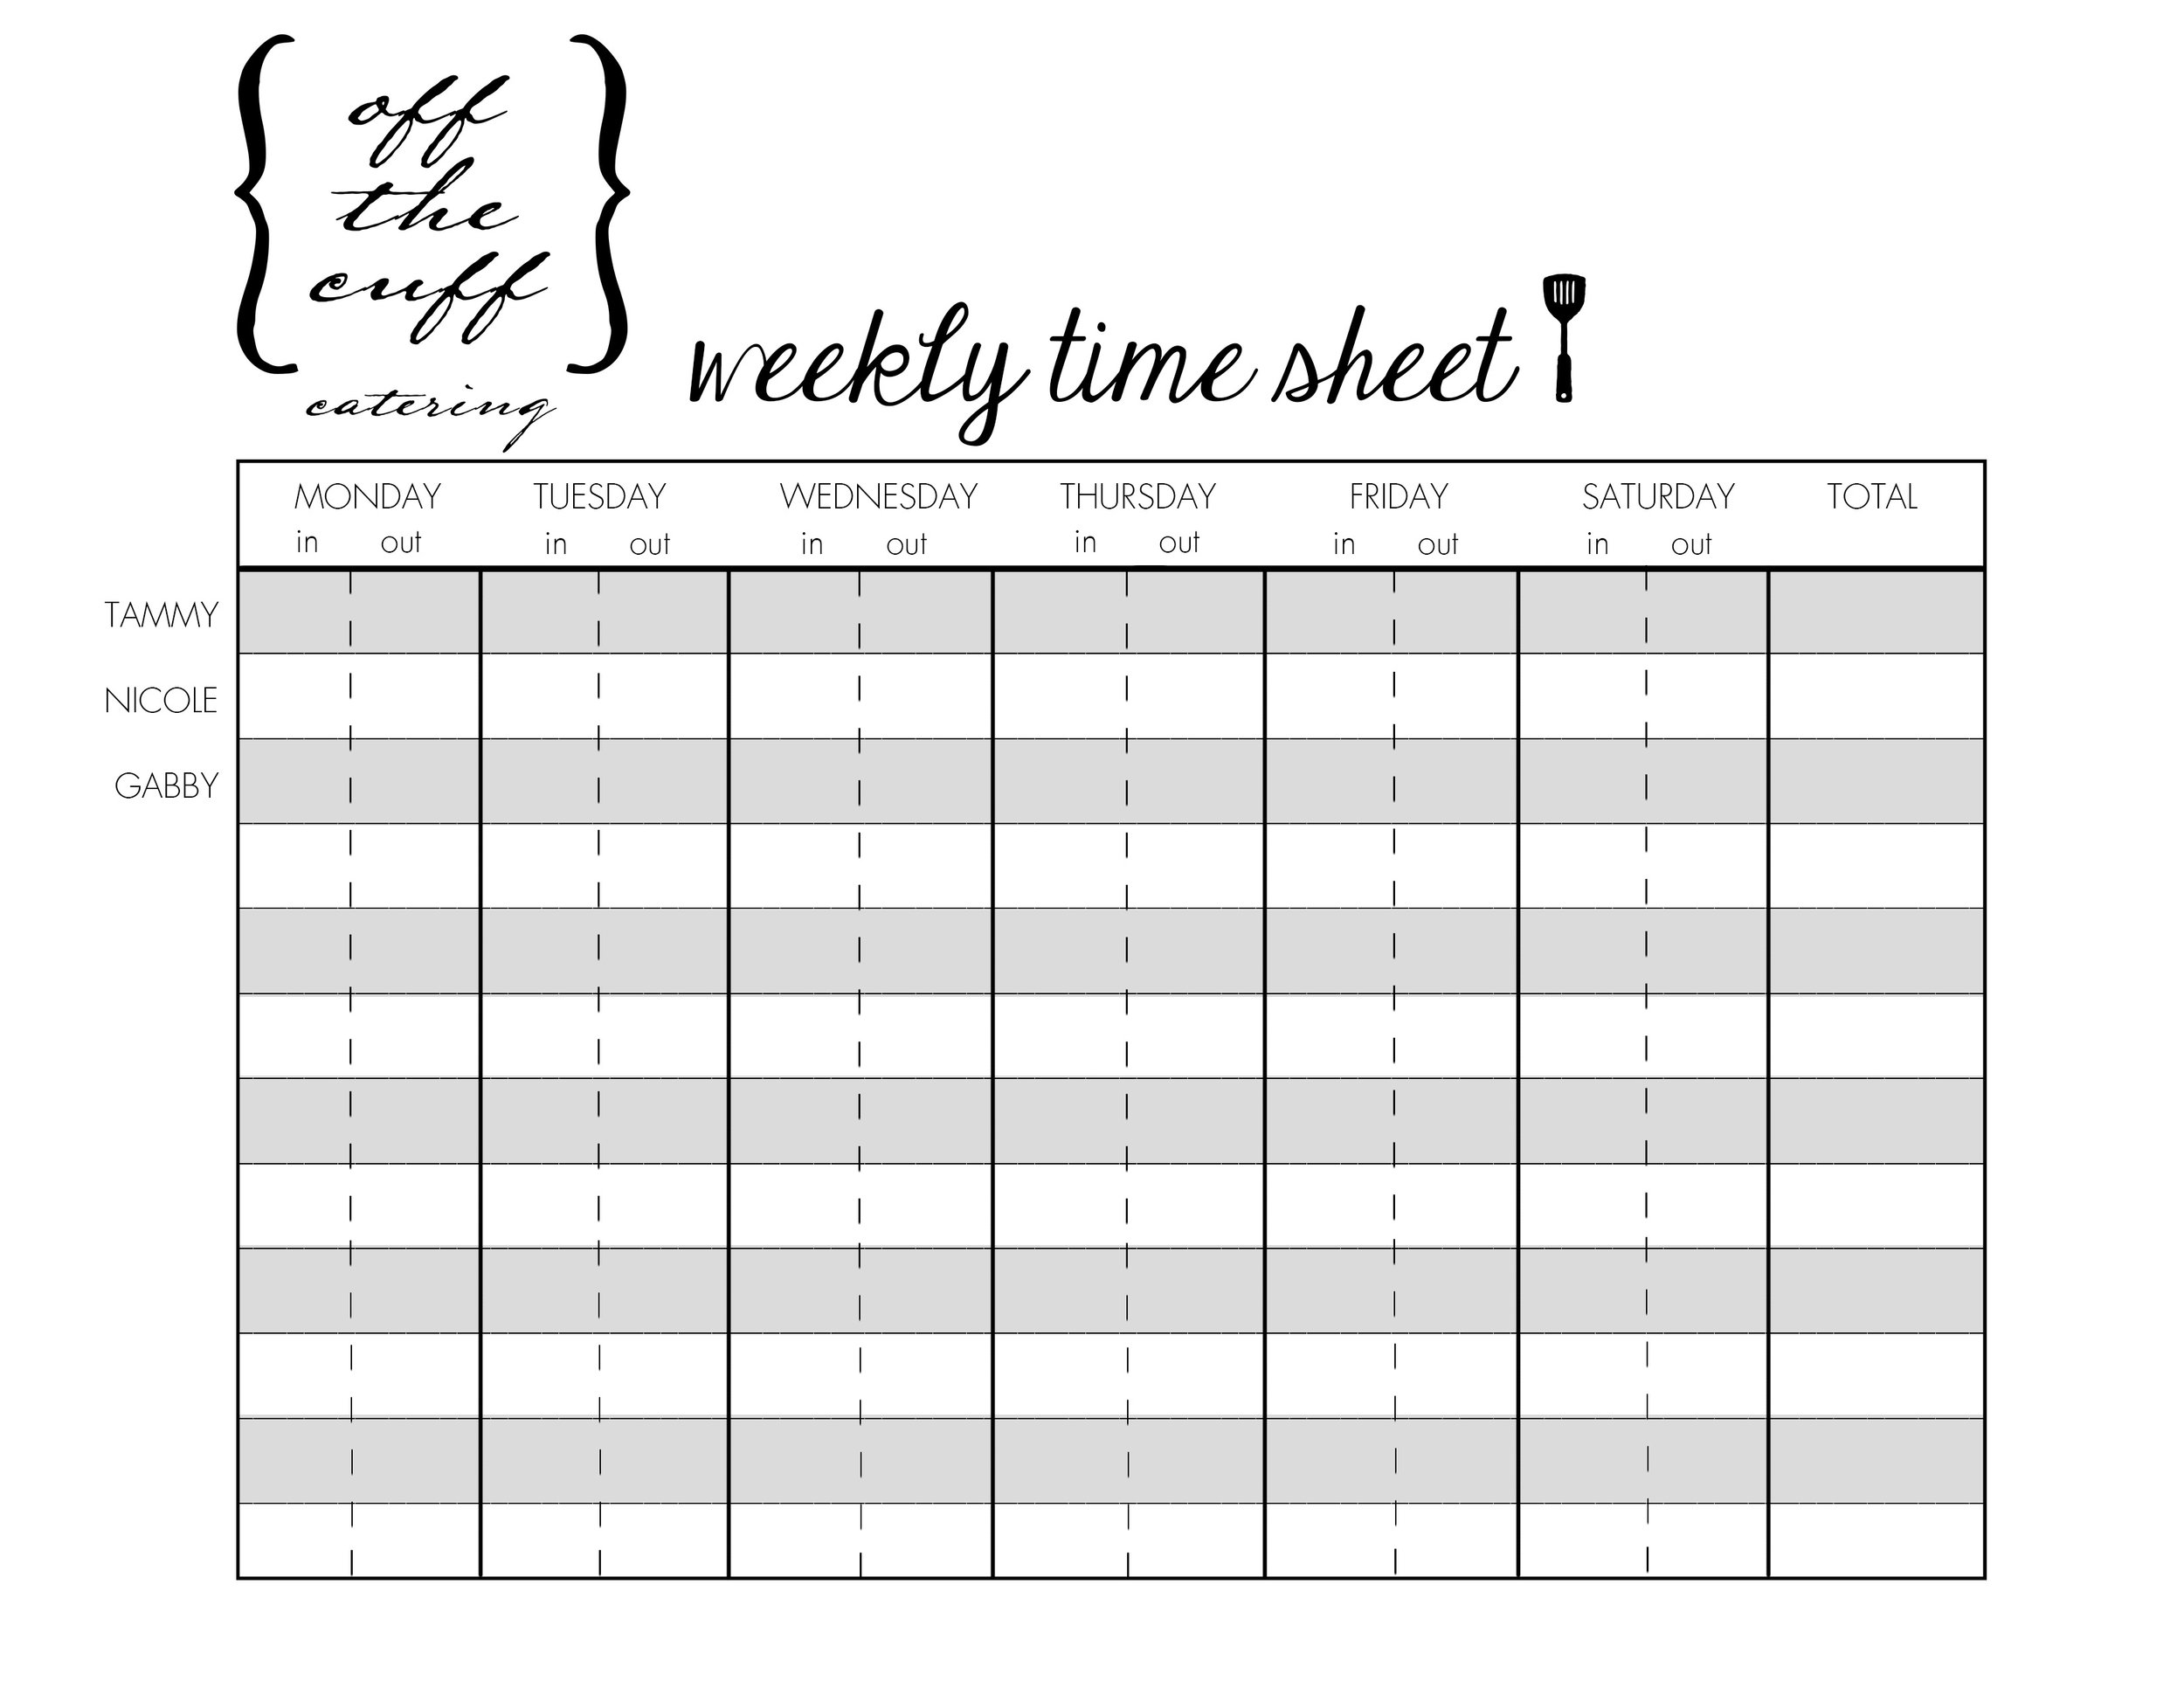 time_sheet.jpg